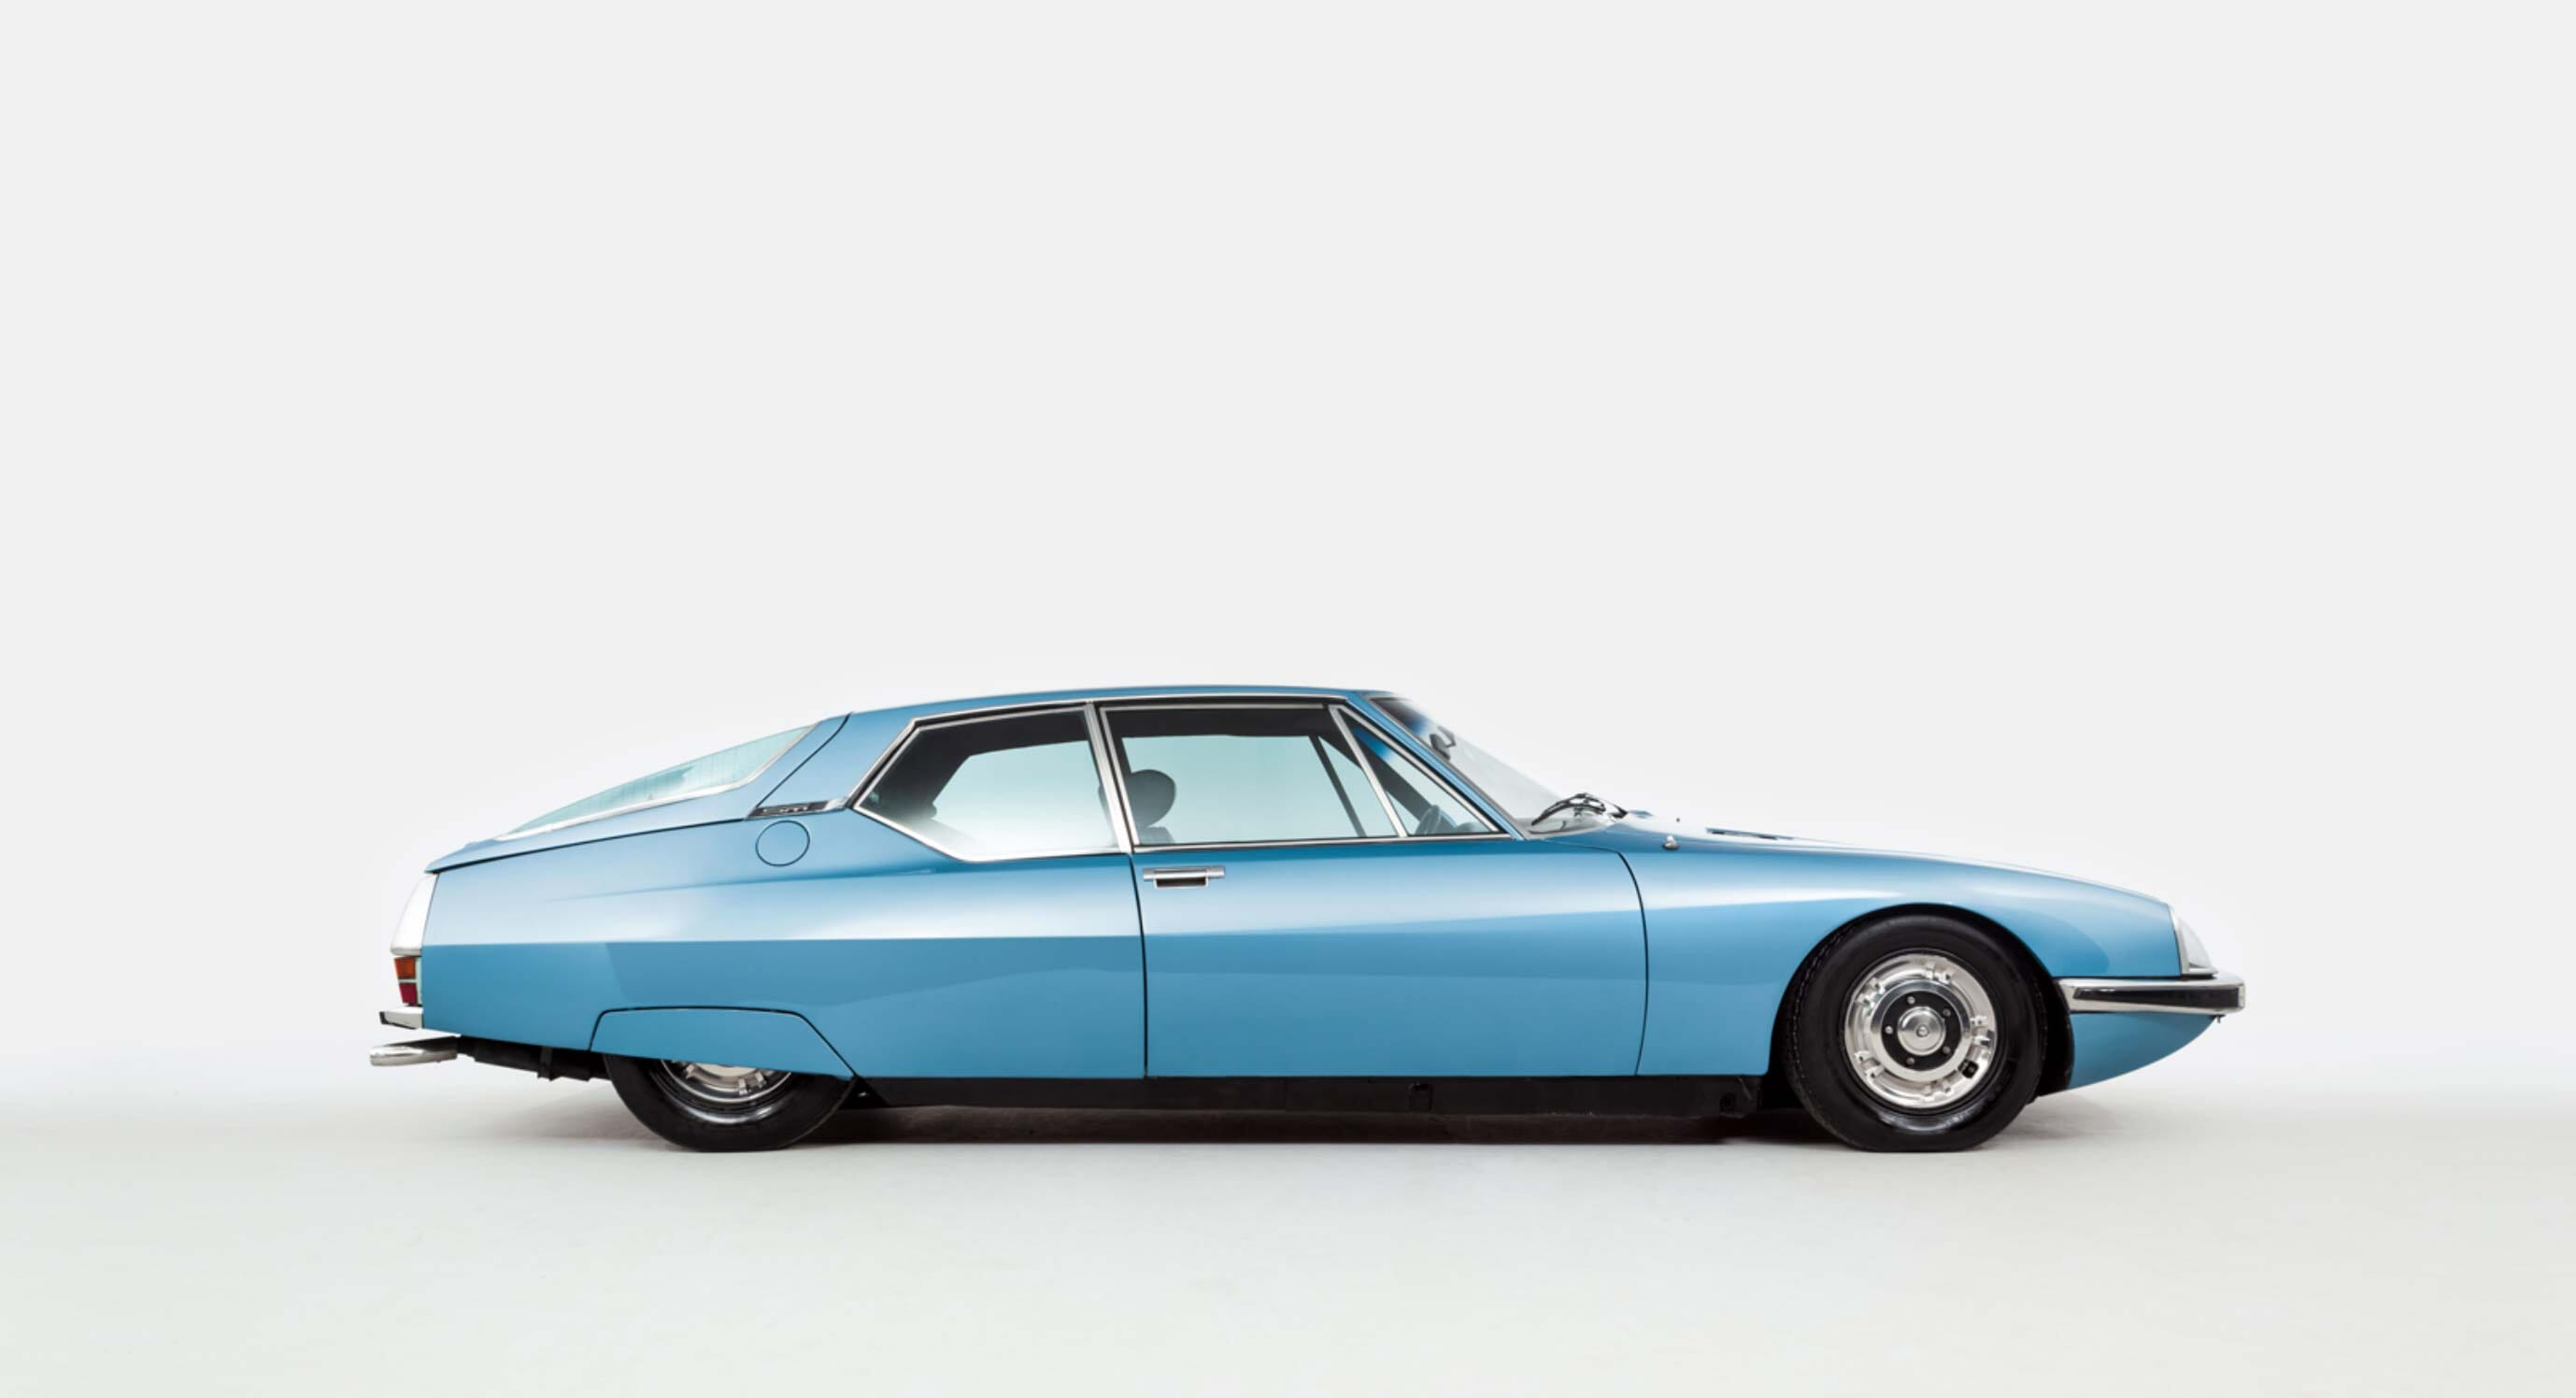 Classic Car Find of the Week: 1971 Citroen SM